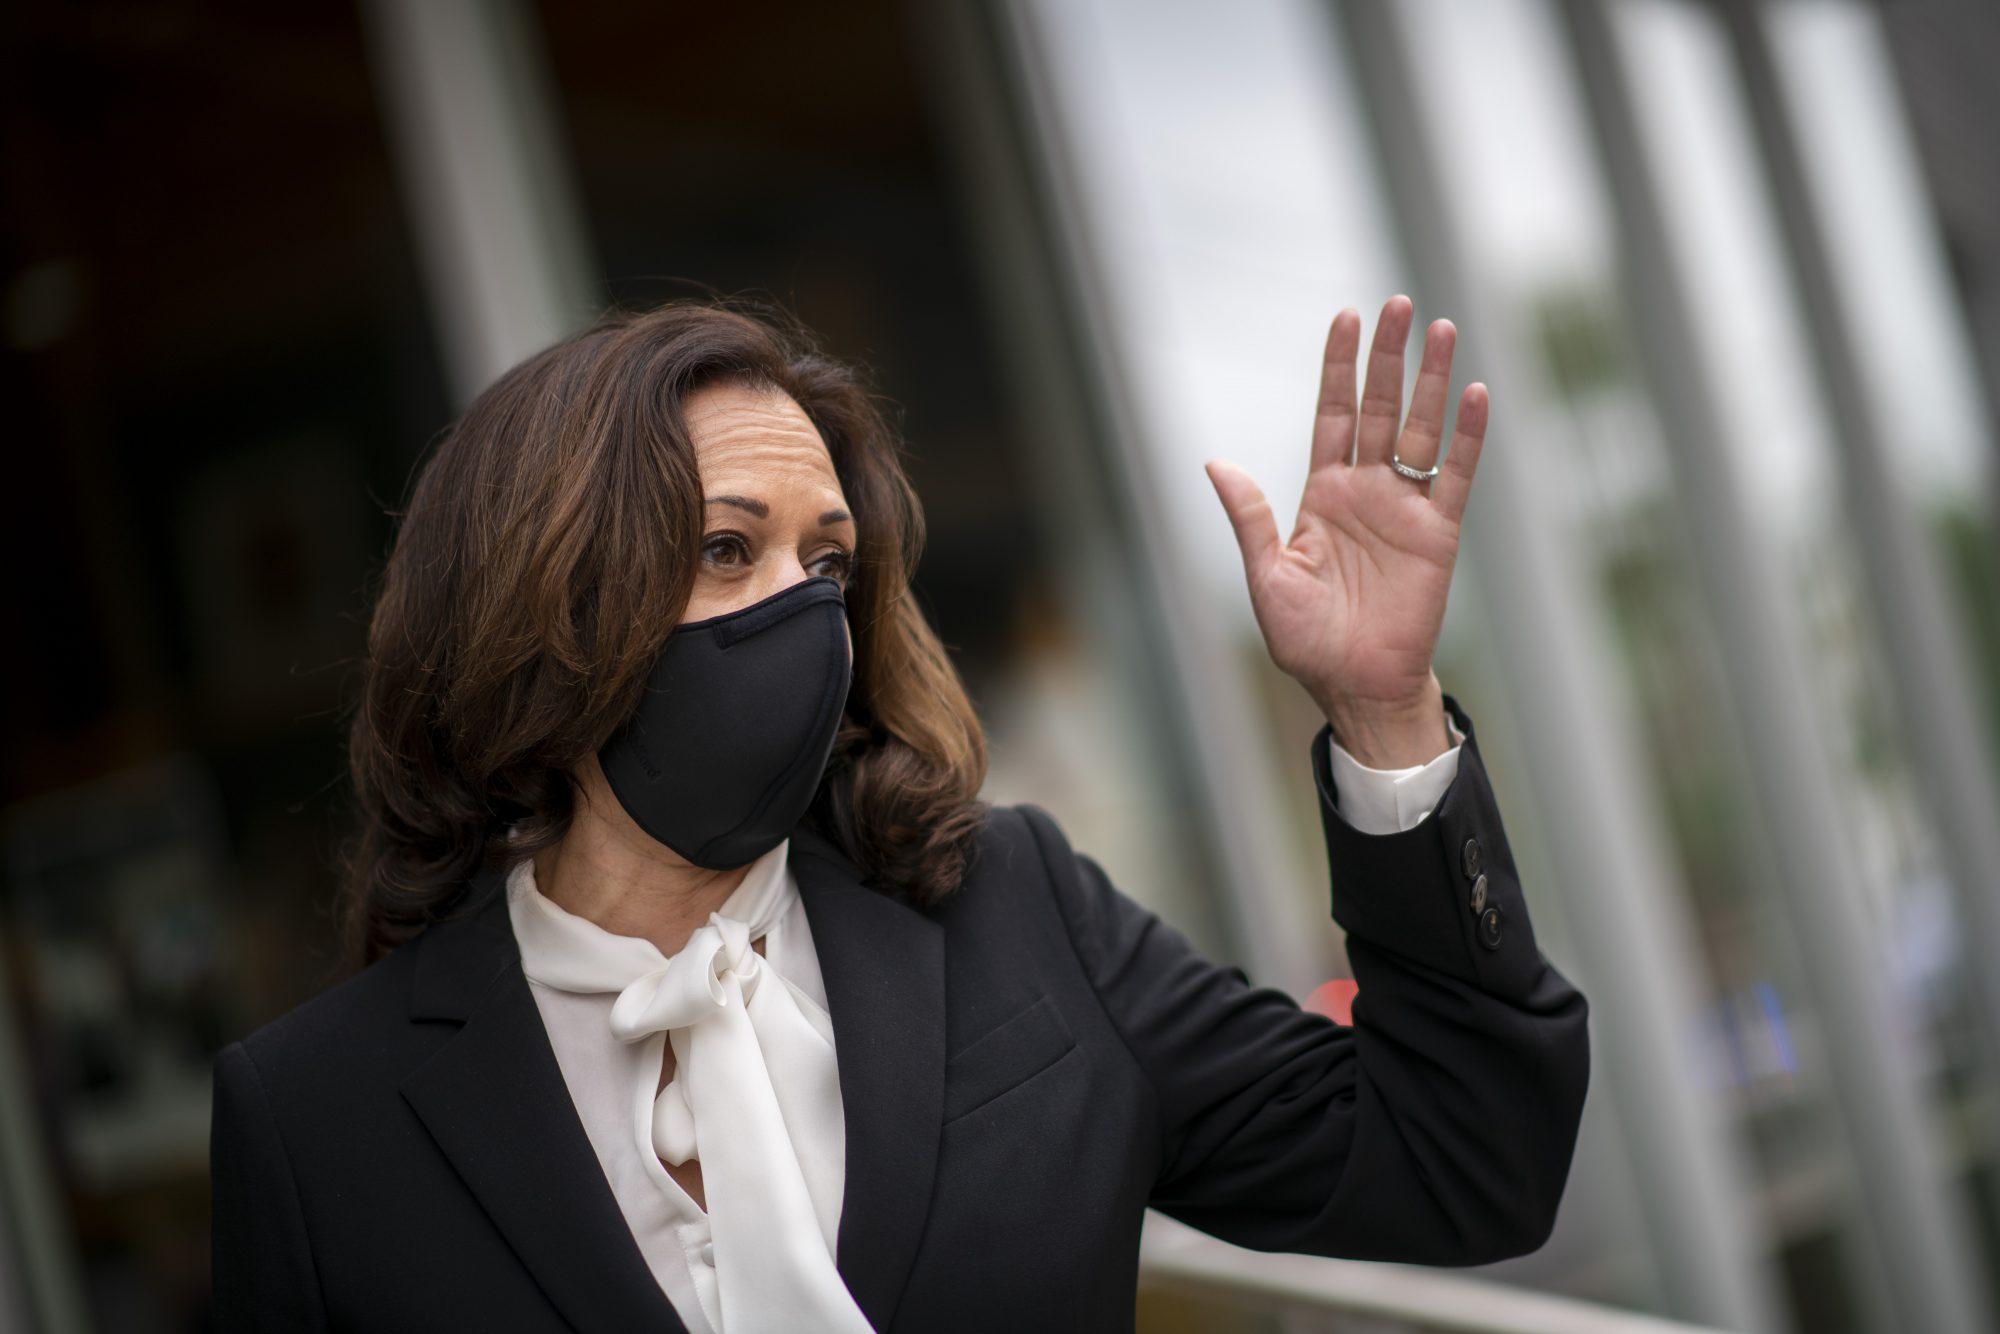 Kamala Harris con mascarilla